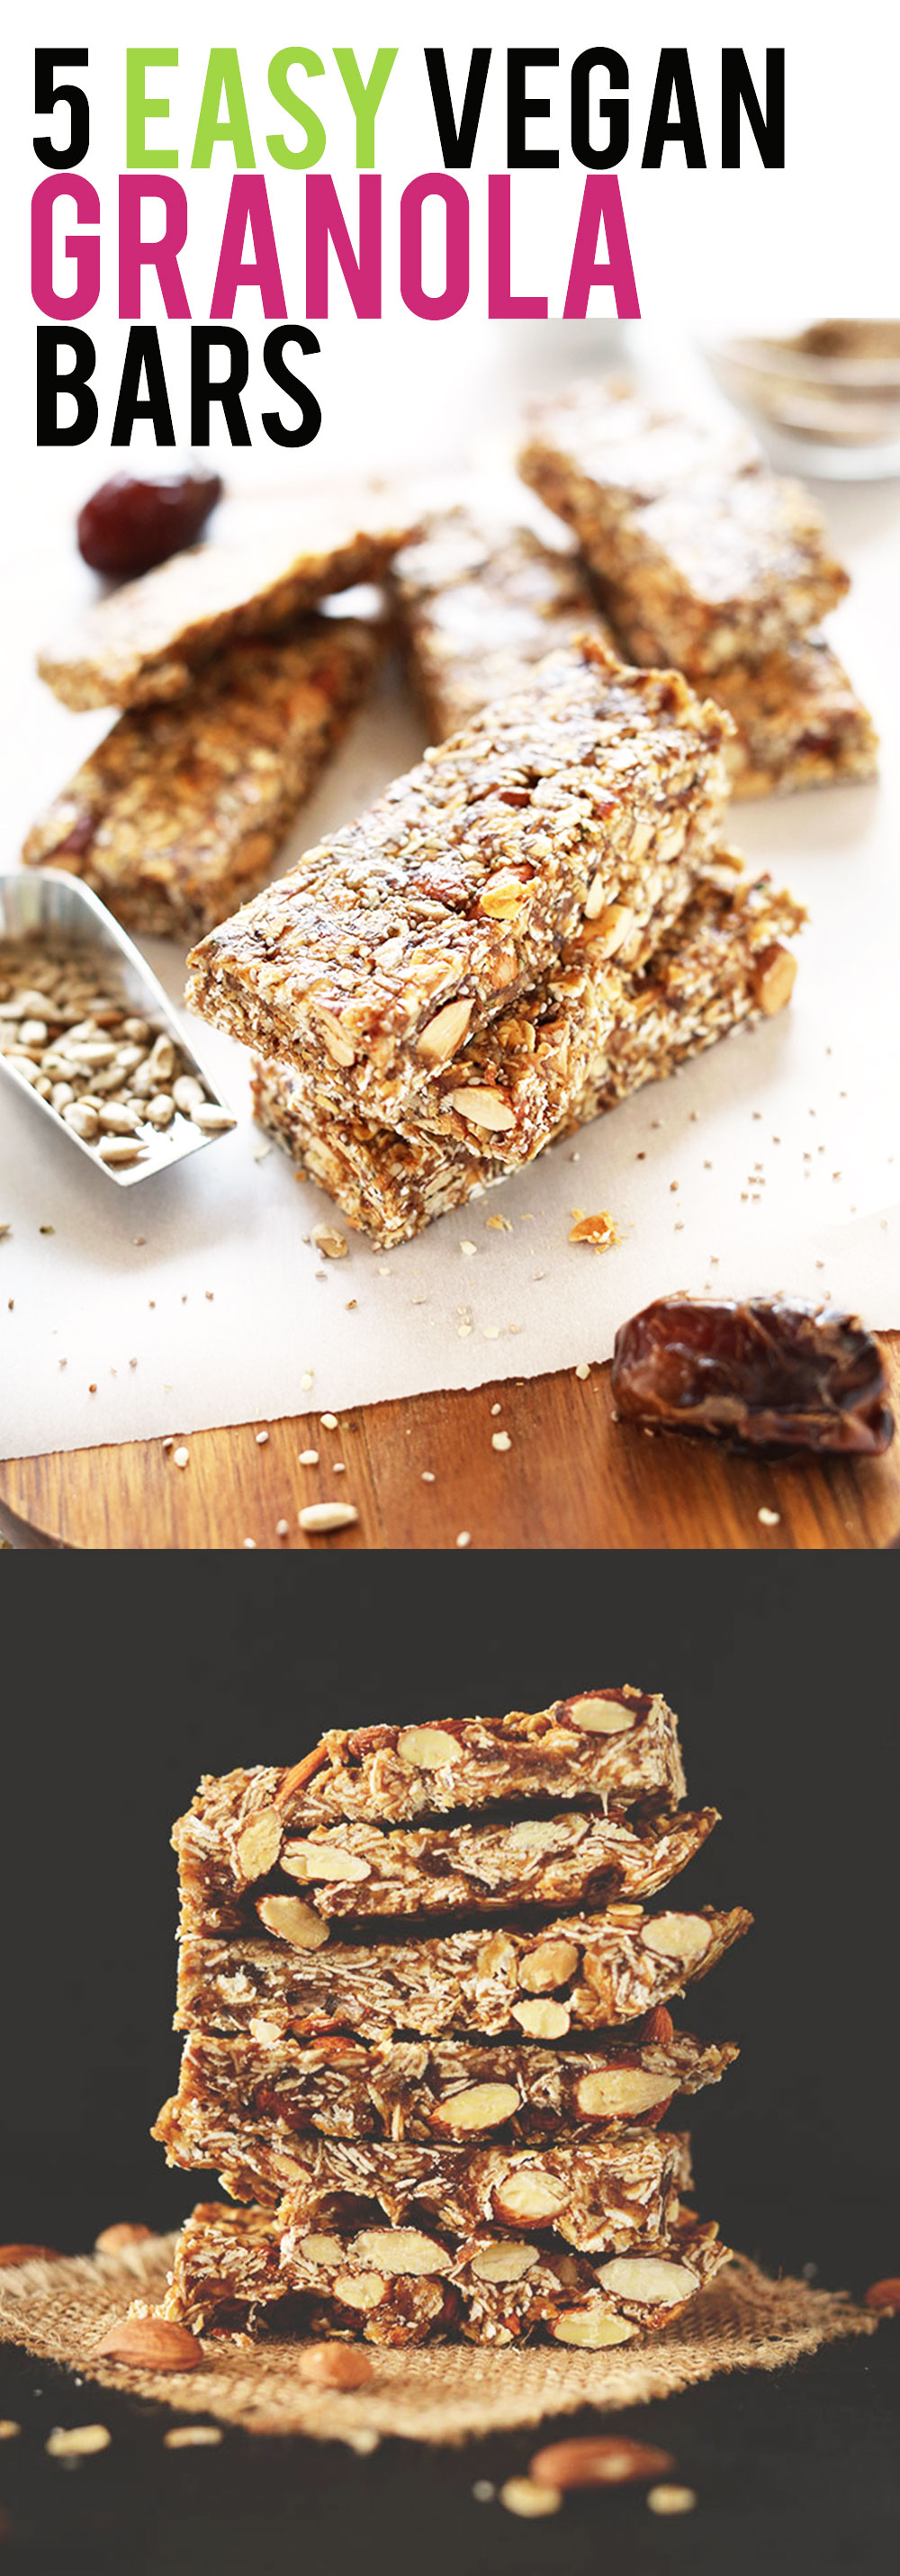 5 EASY Vegan Granola Bar recipes. Wholesome ingredients, simple preparation and BIG flavor! #vegan